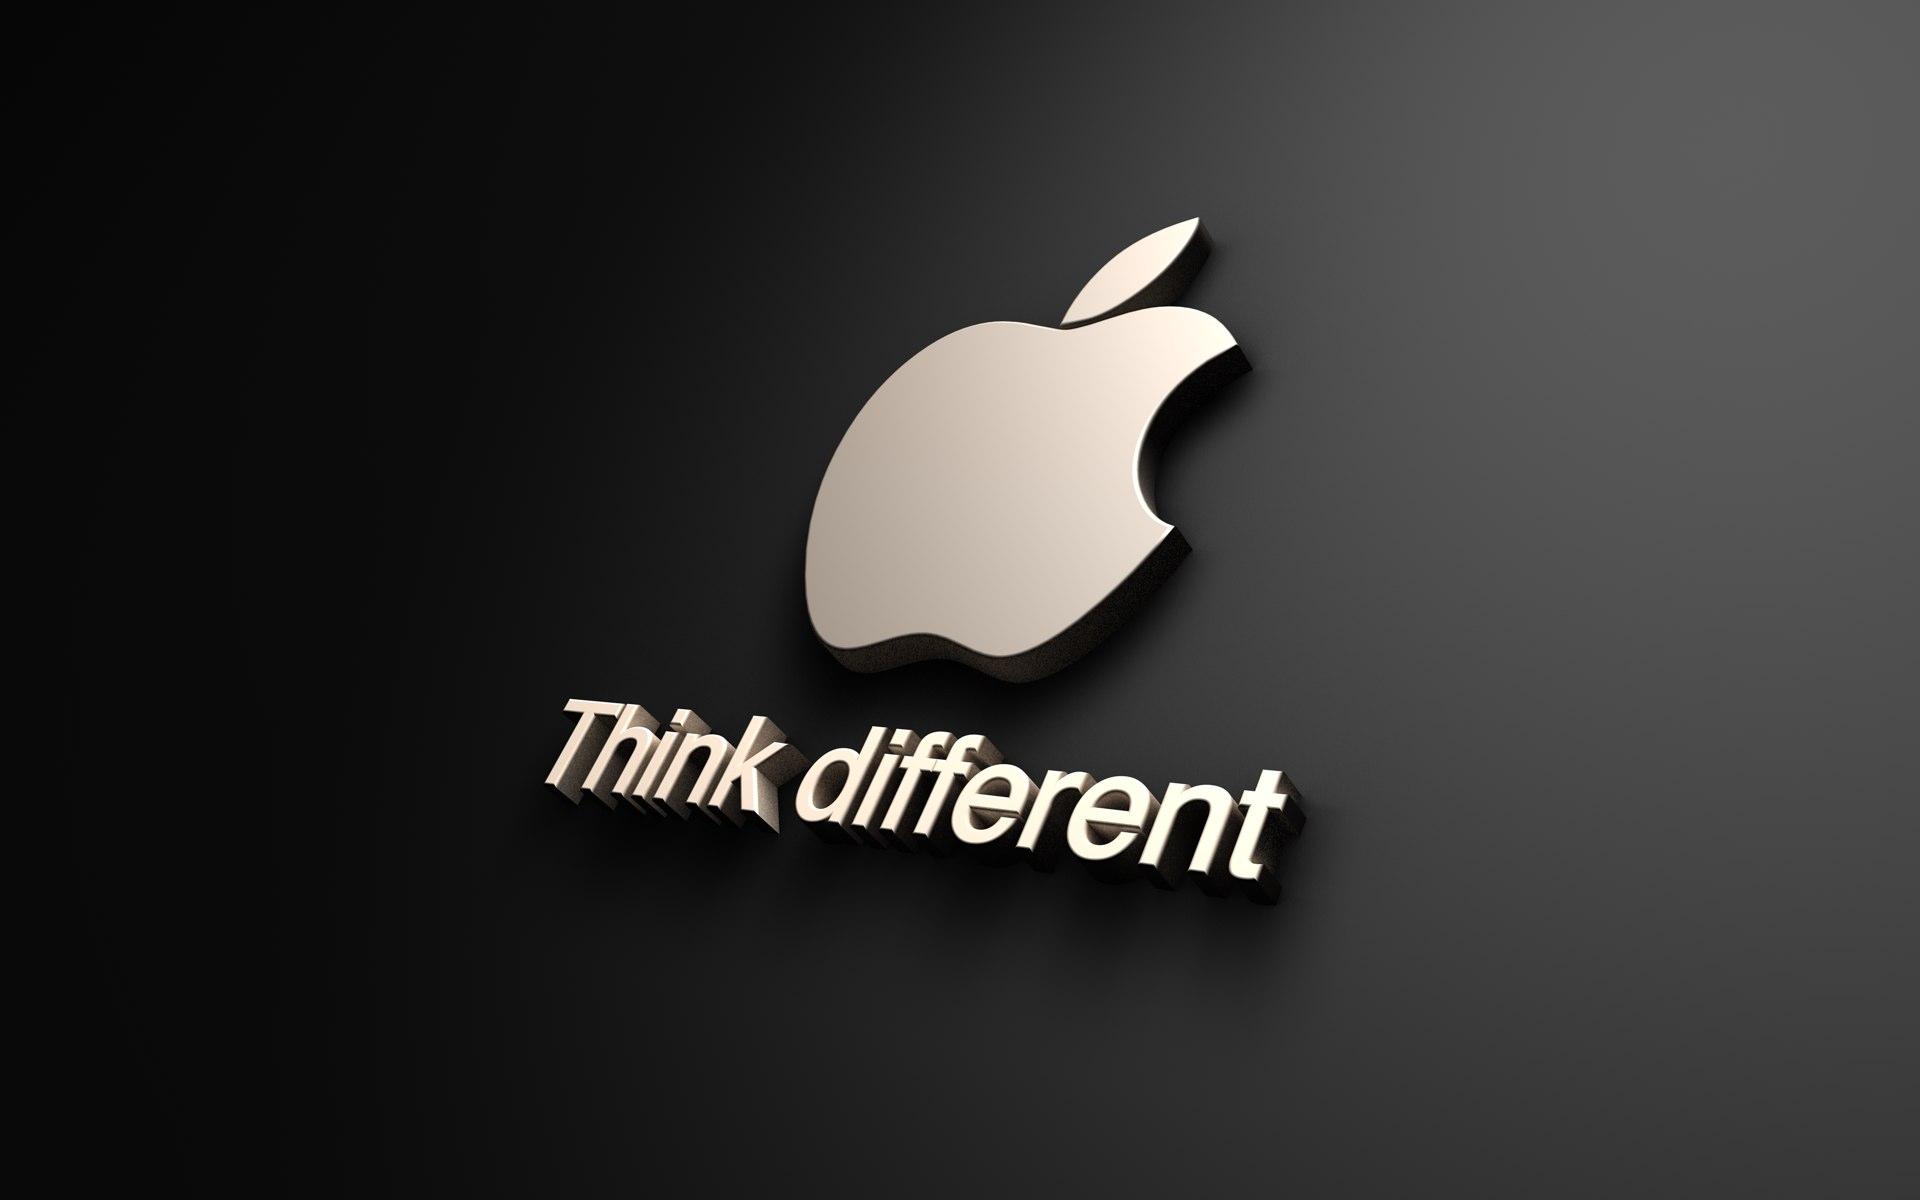 Cool Apple Logo 1920x1200